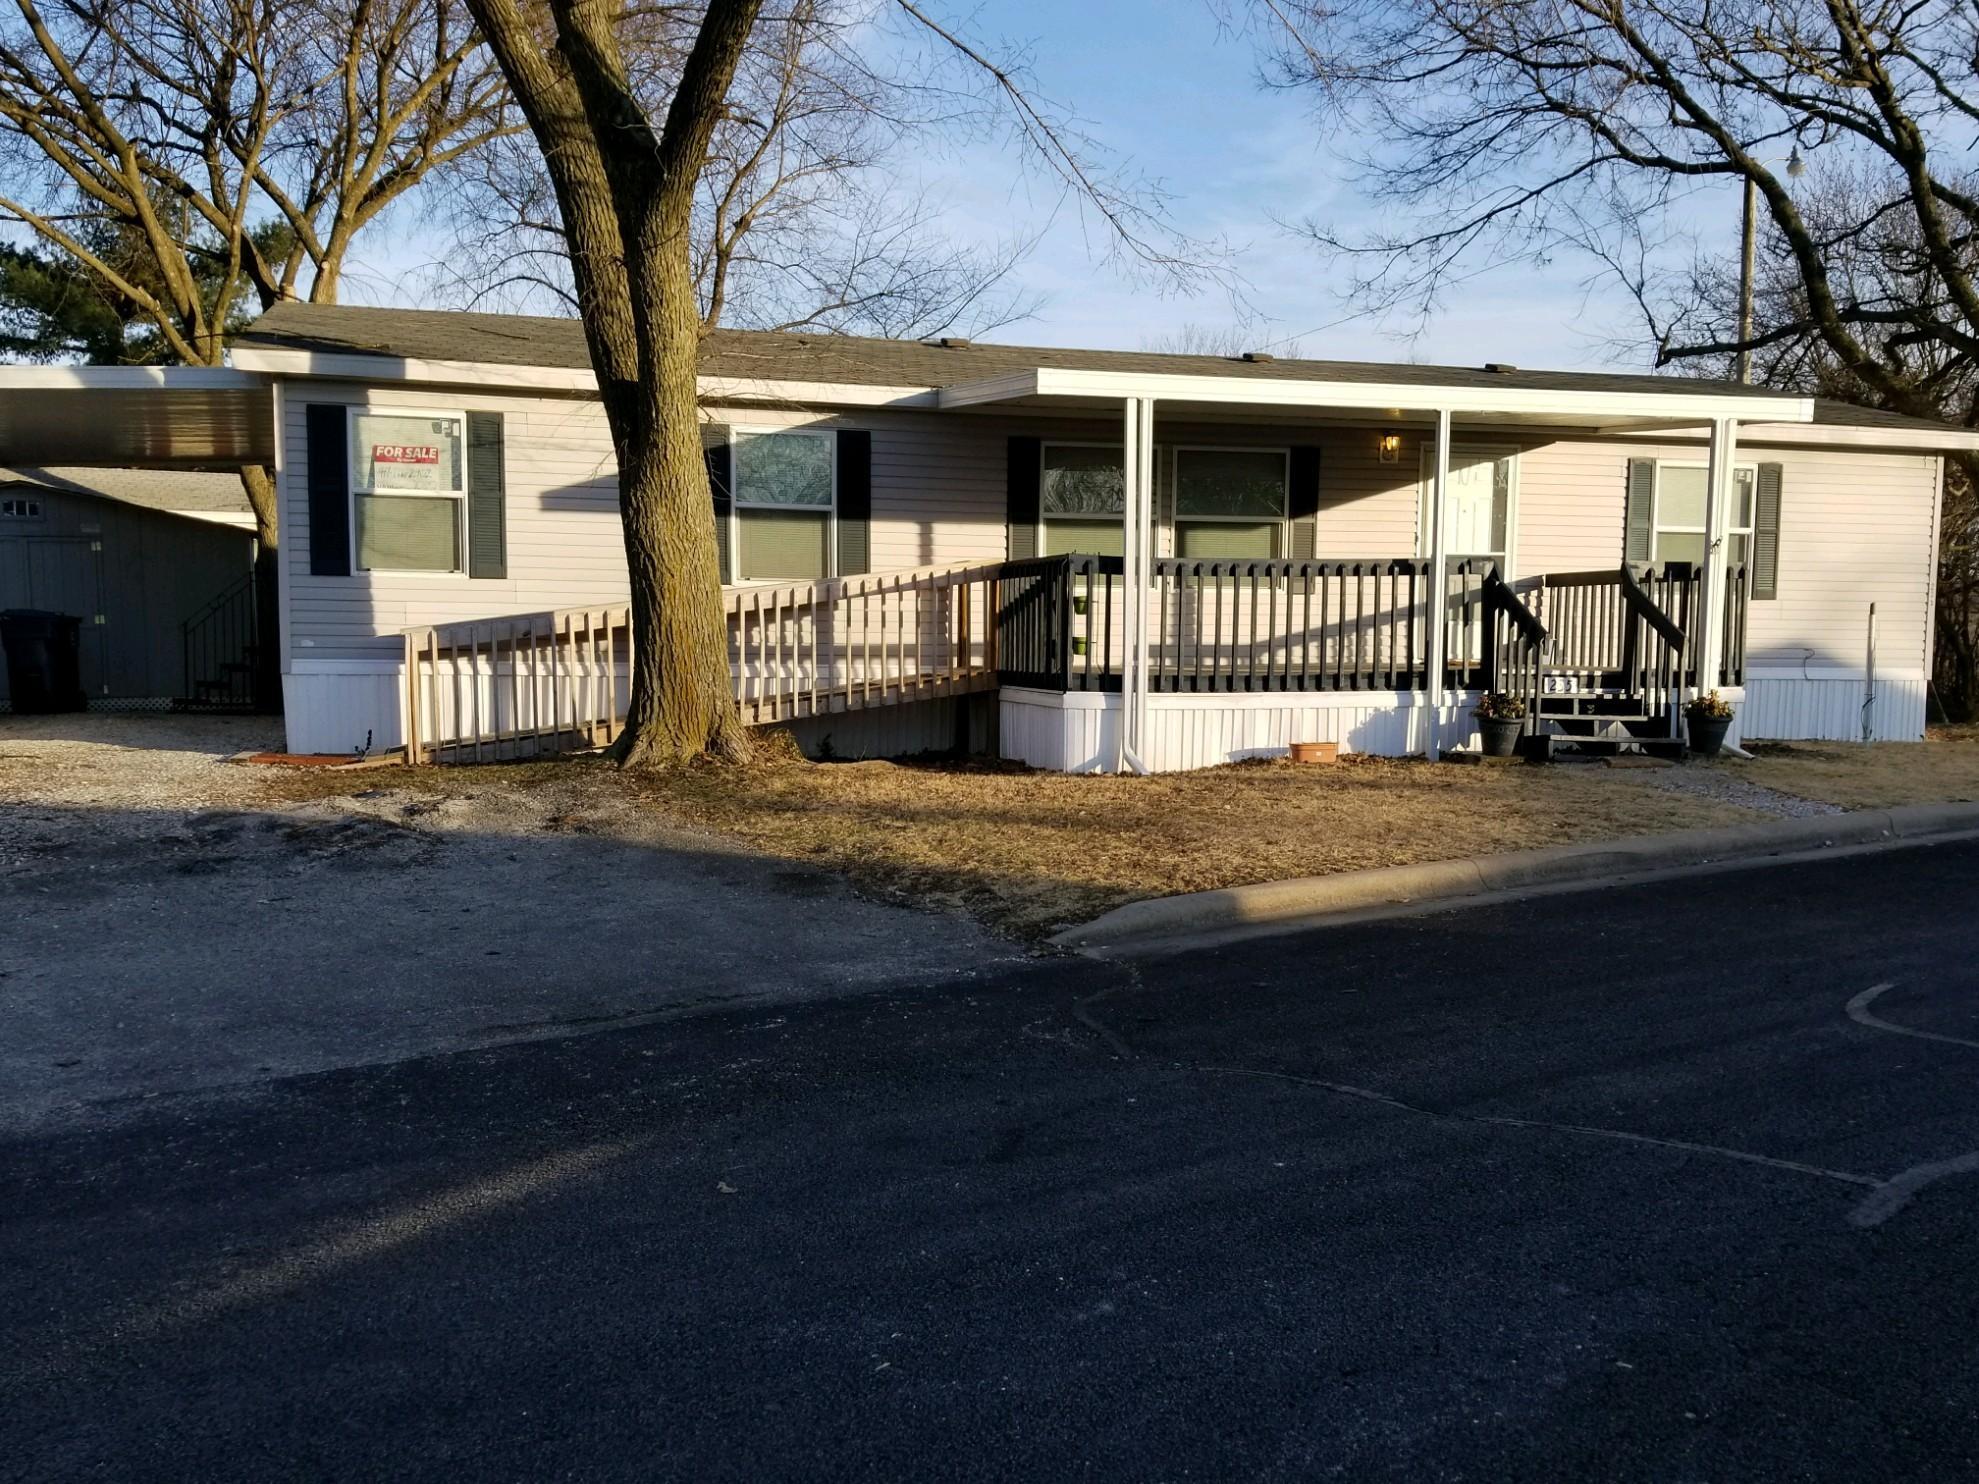 2710 North Farm Rd 137 #Lot 235 Springfield, MO 65803